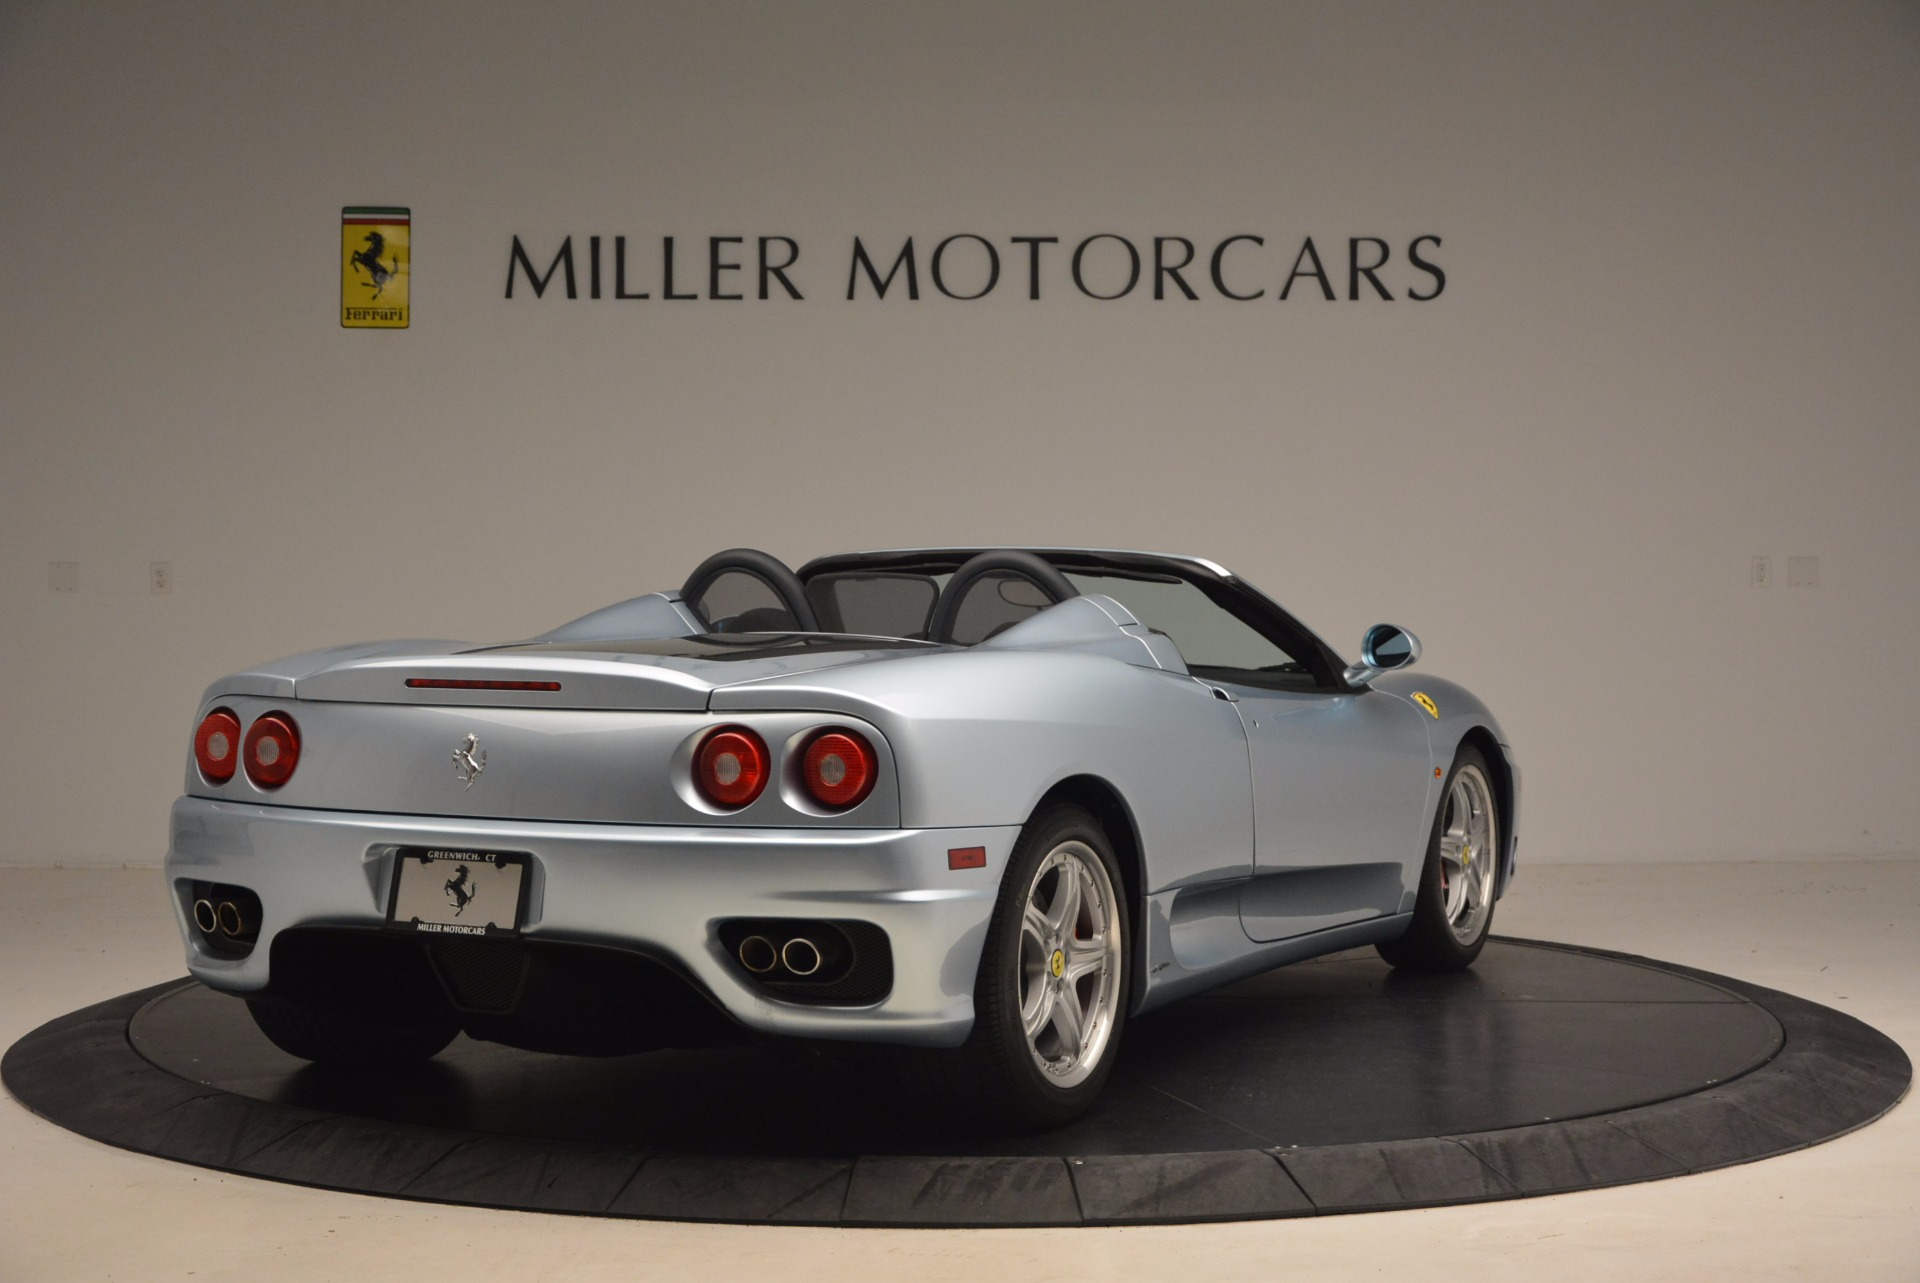 Used 2003 Ferrari 360 Spider 6-Speed Manual For Sale In Westport, CT 1445_p7